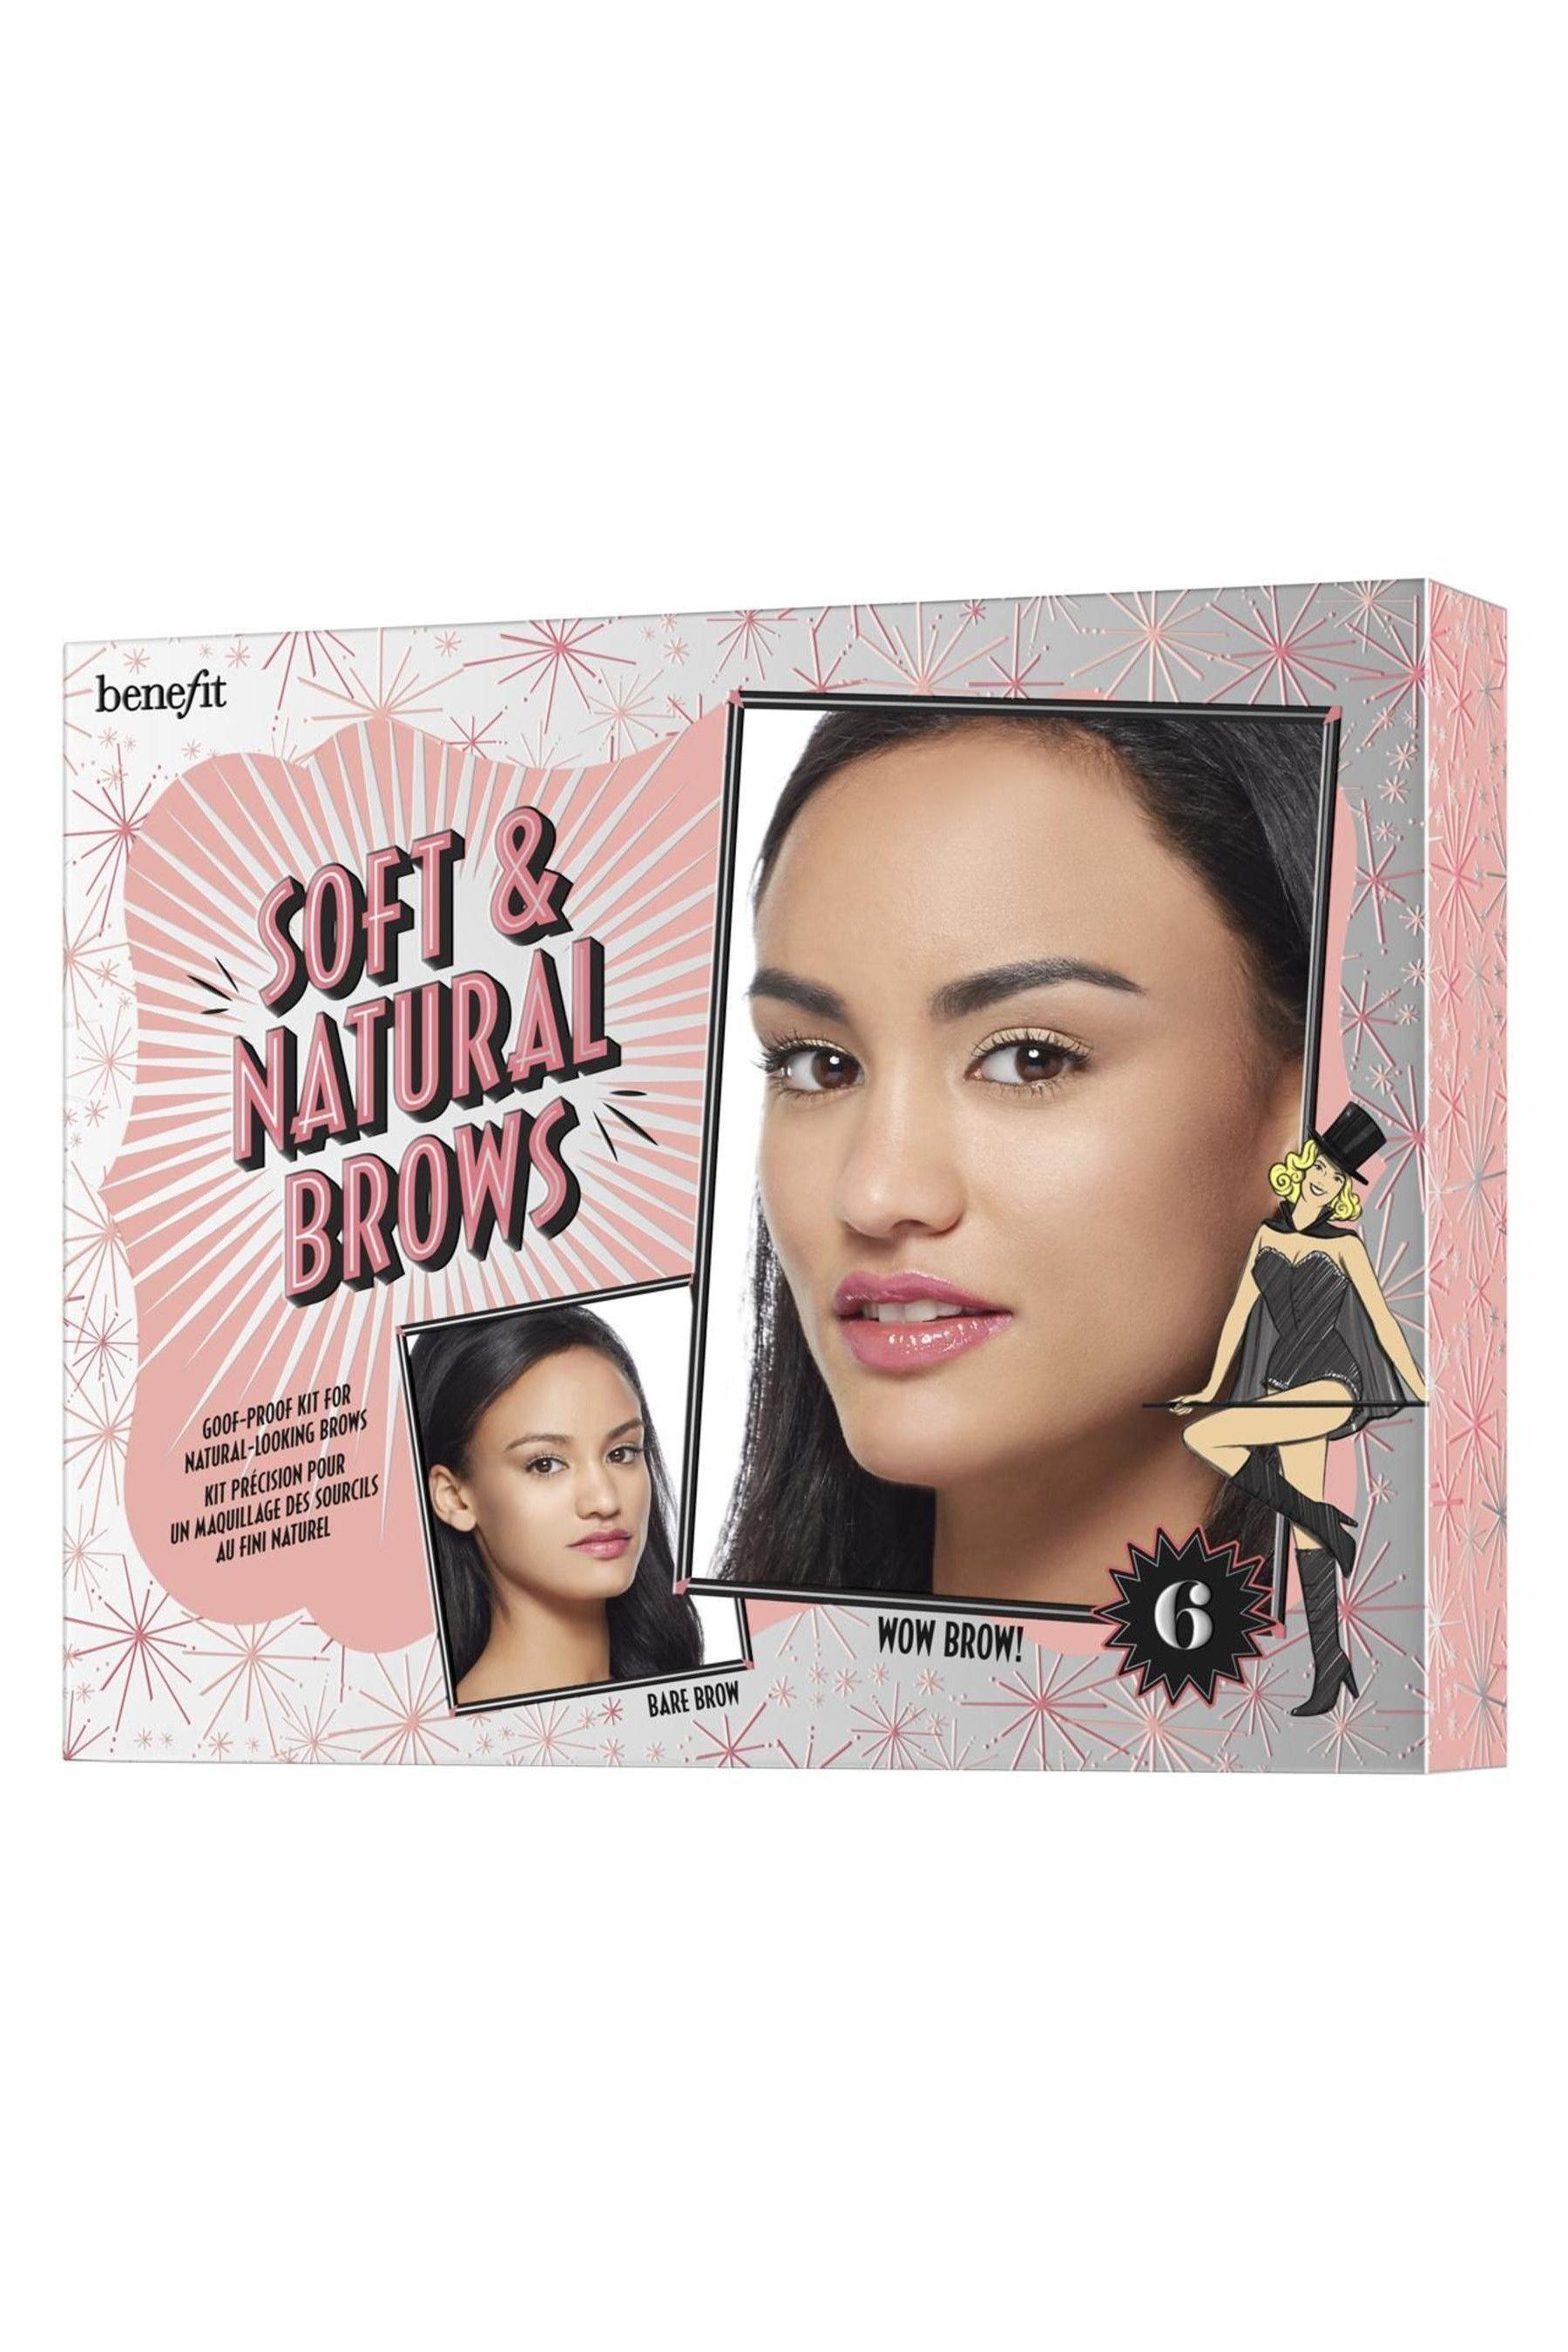 Womens Benefit Soft & Natural Brows Kit #naturalbrows Womens Benefit Soft & Natural Brows Kit -  No Colour #naturalbrows